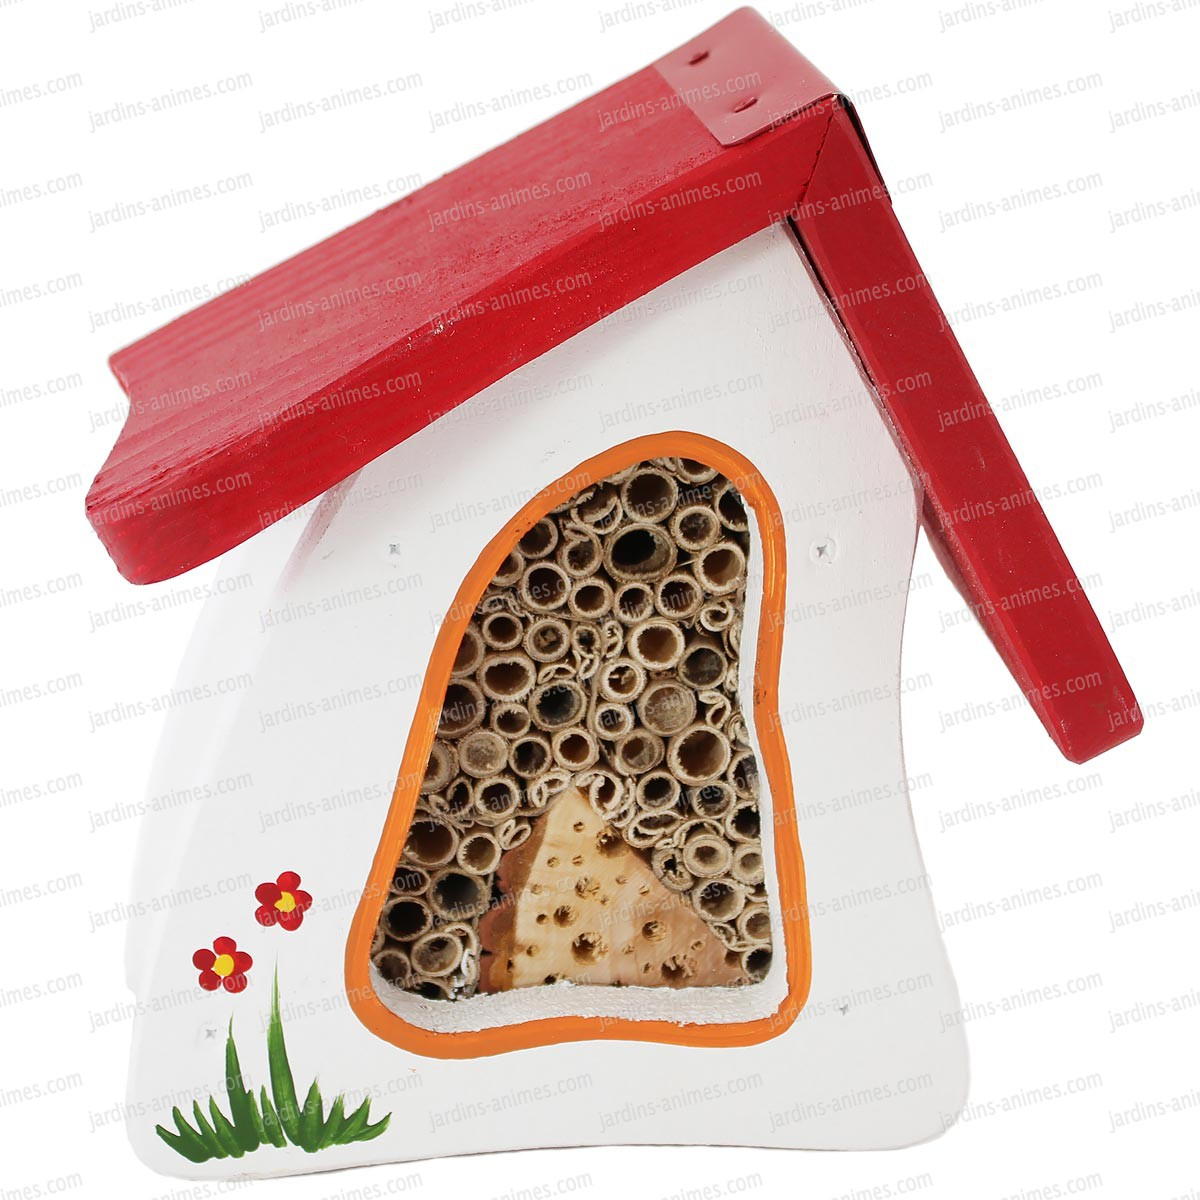 Villa insectes blanc maisons abris animaux - Maison a insectes fabrication ...